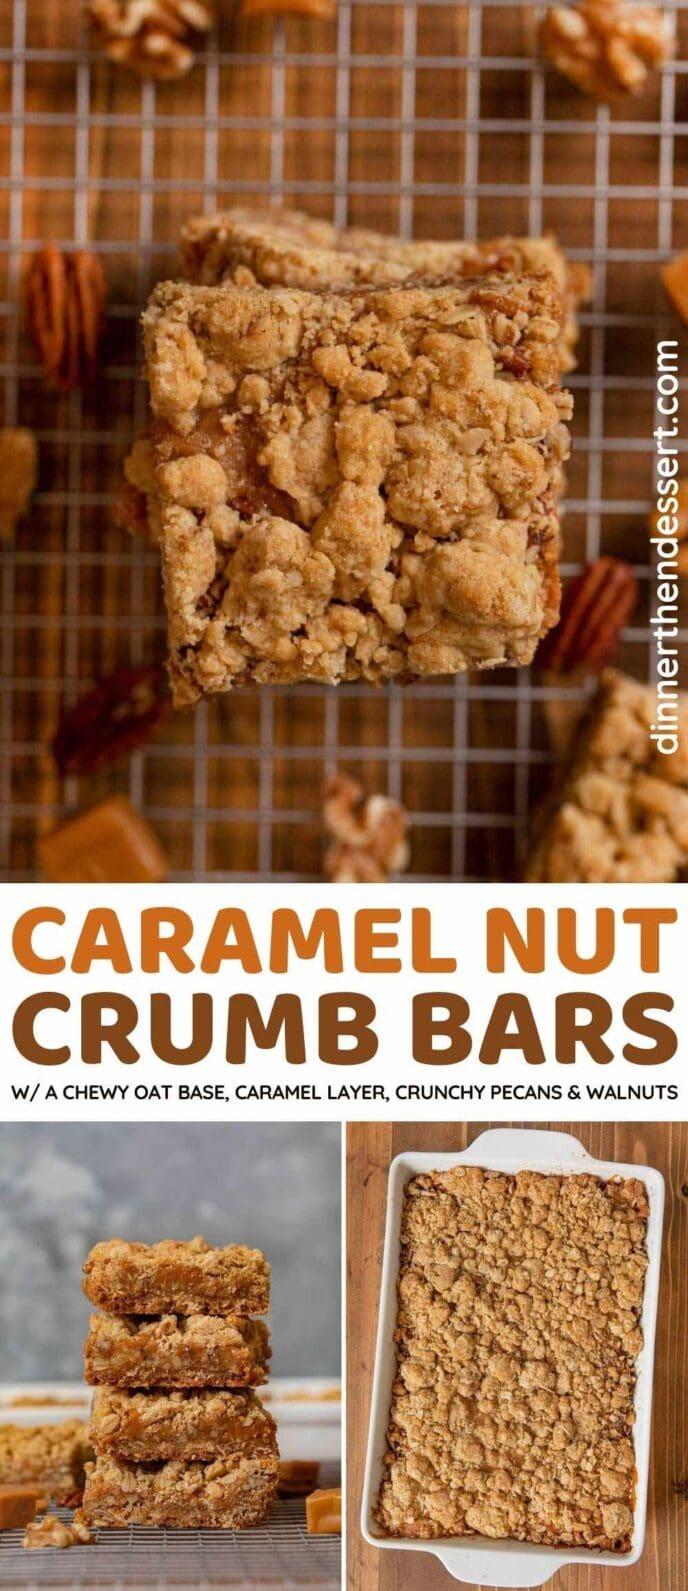 Caramel Nut Crumb Bars collage